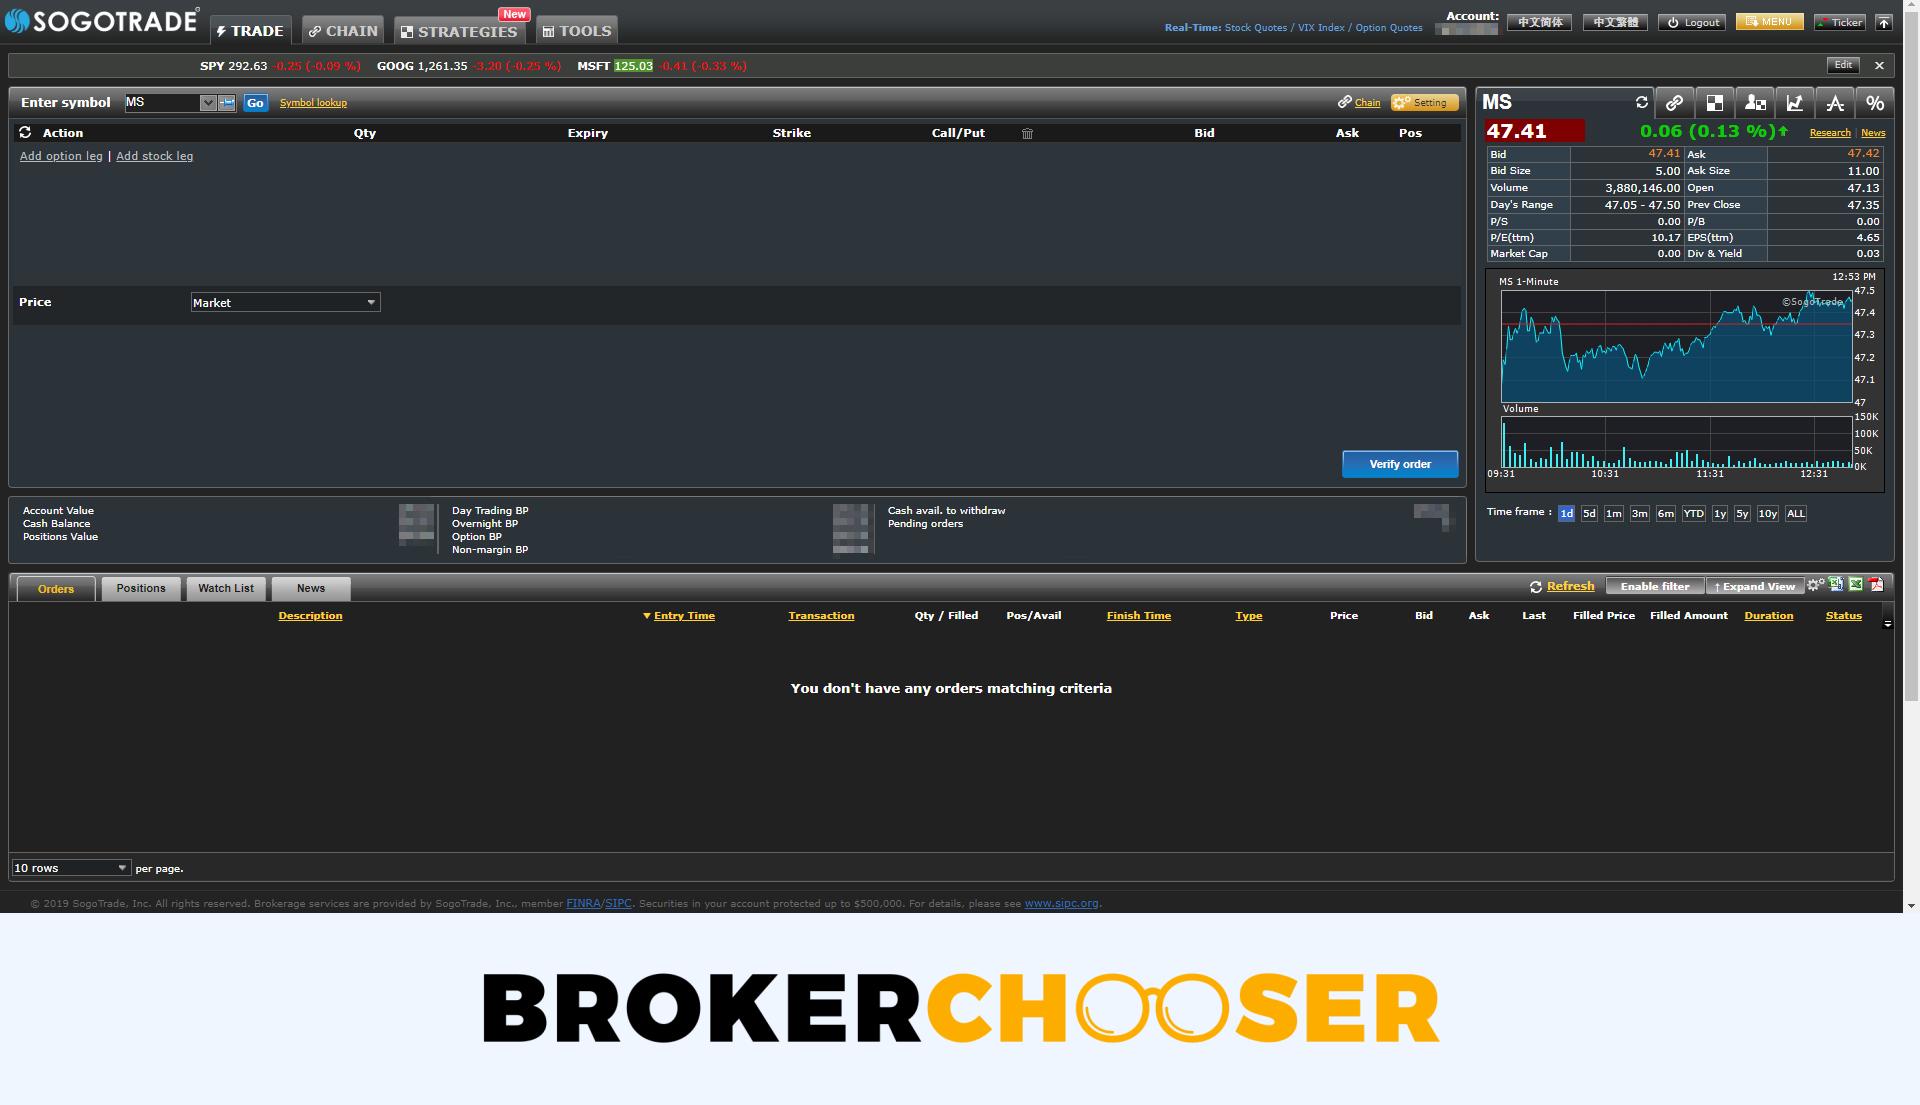 SogoTrade review - Web trading platform